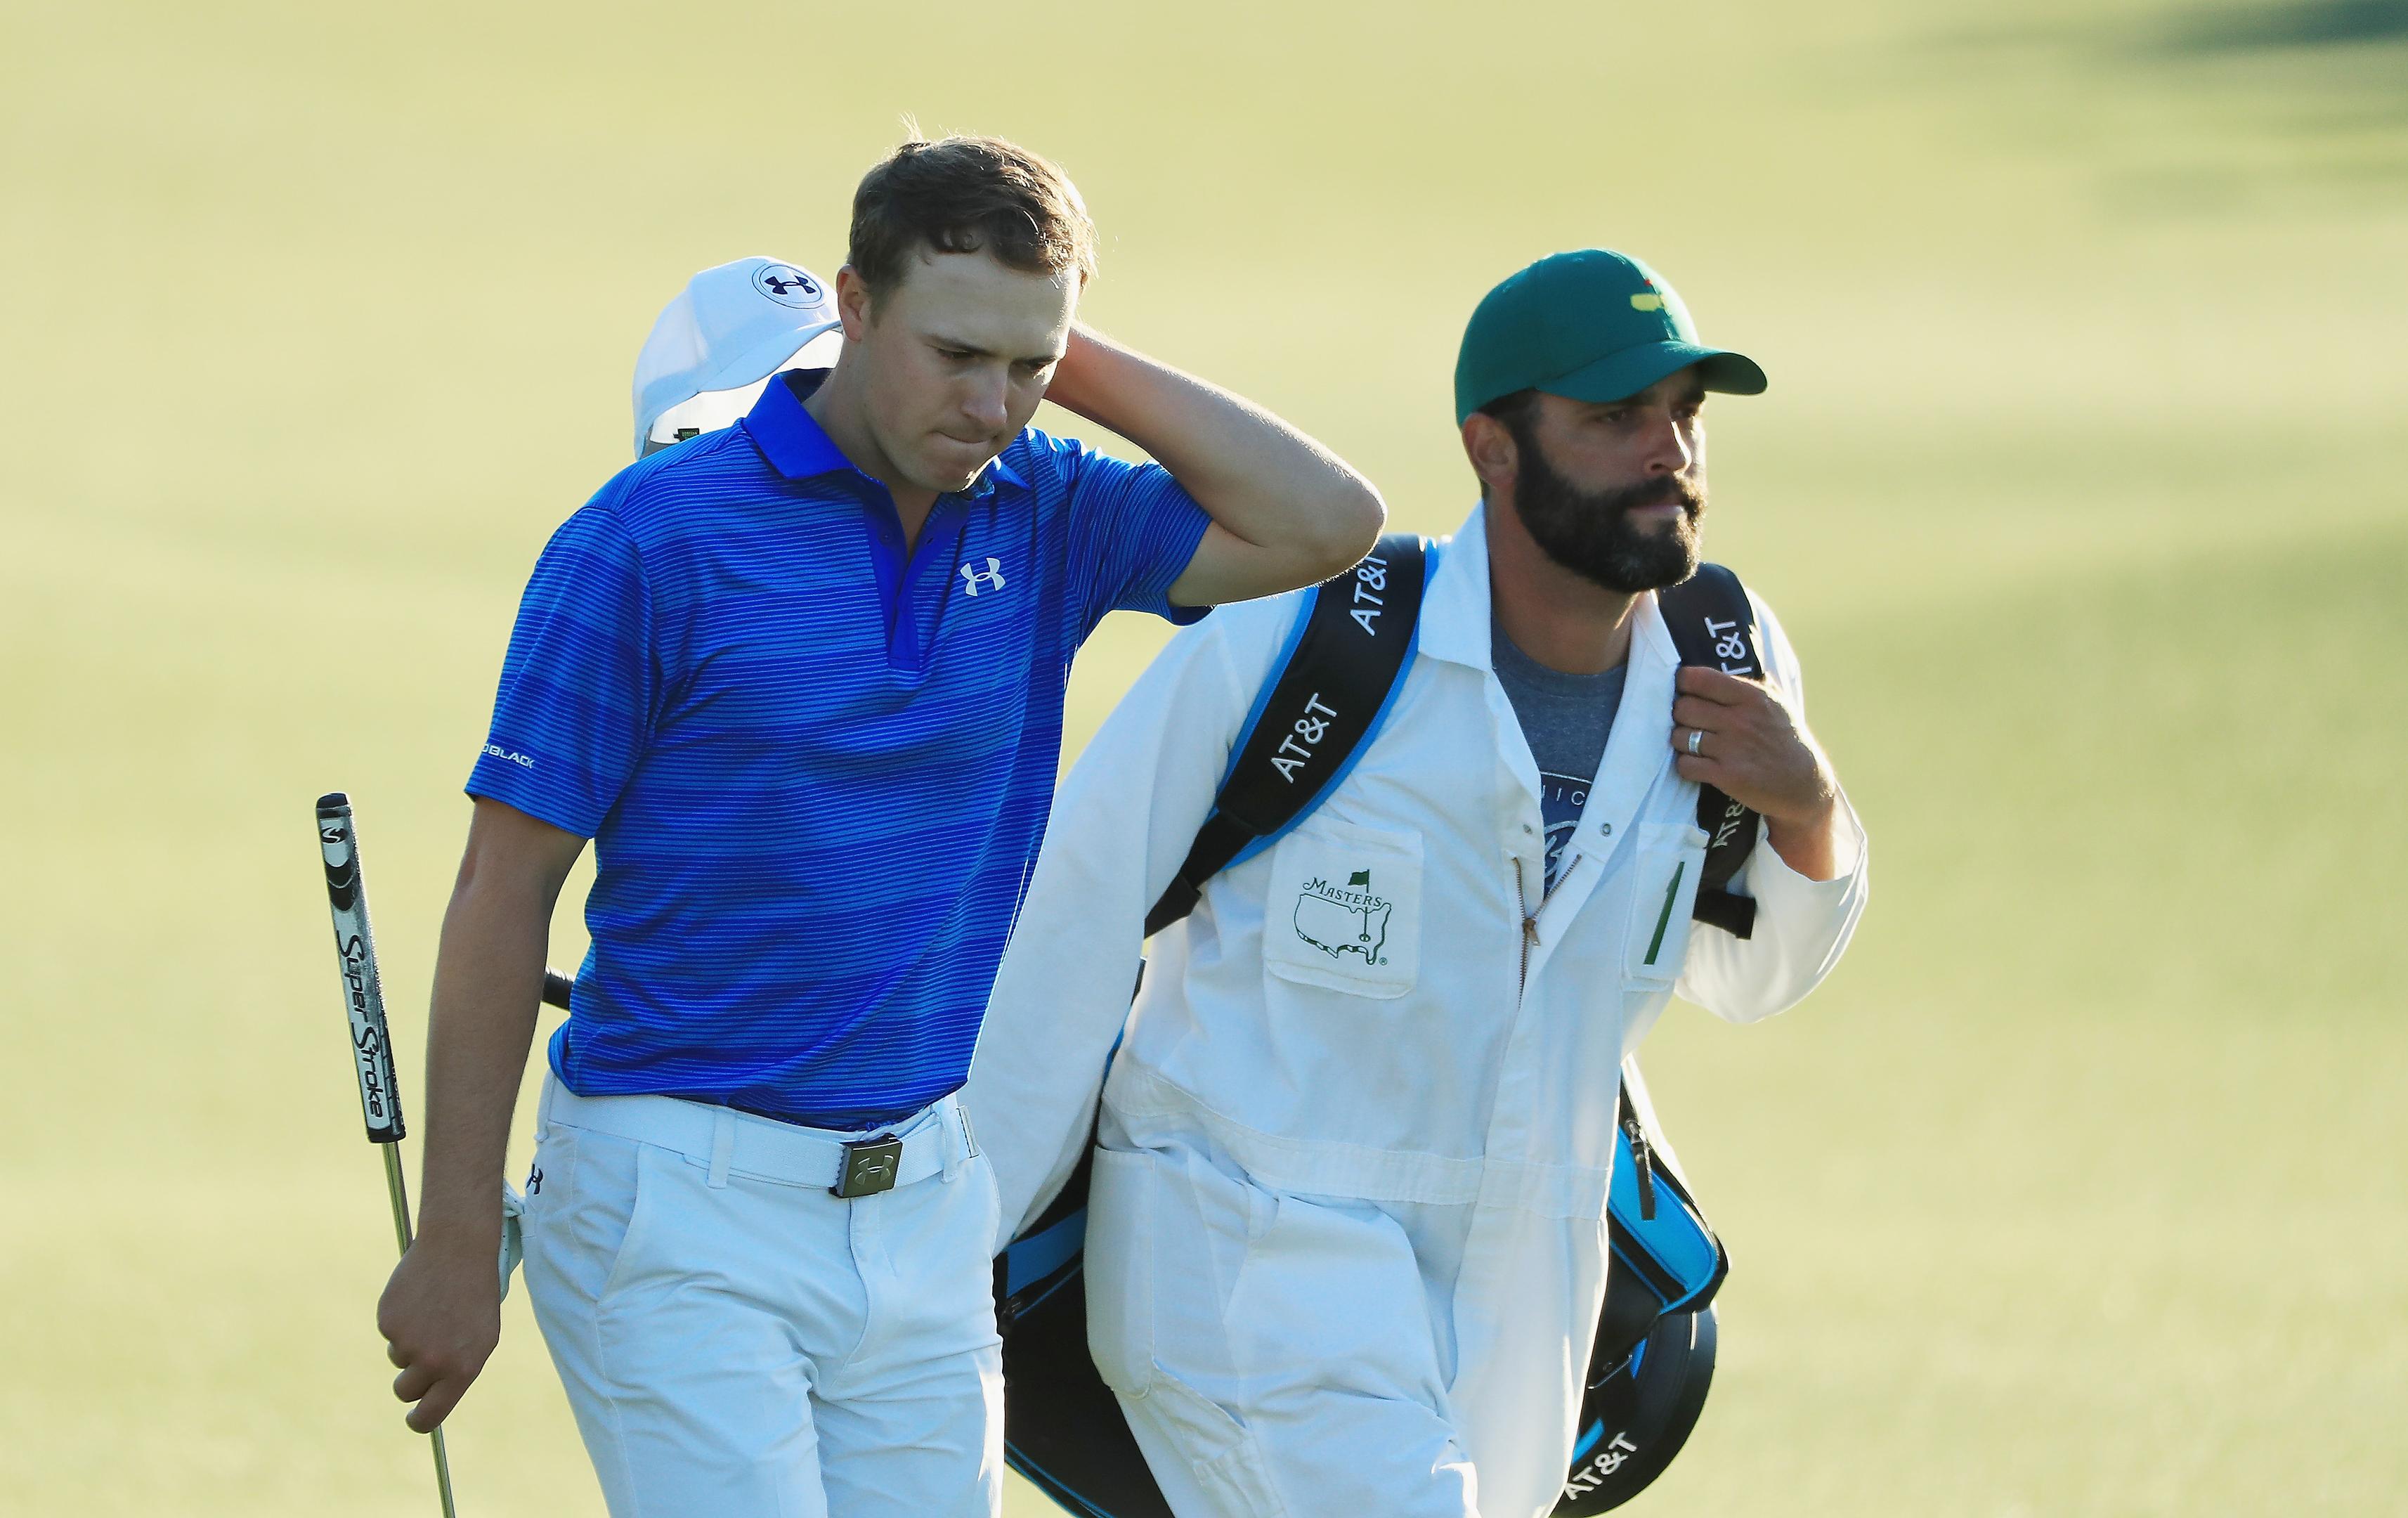 Jordan Speith ( Scott Halleran/Getty Images for Golfweek)